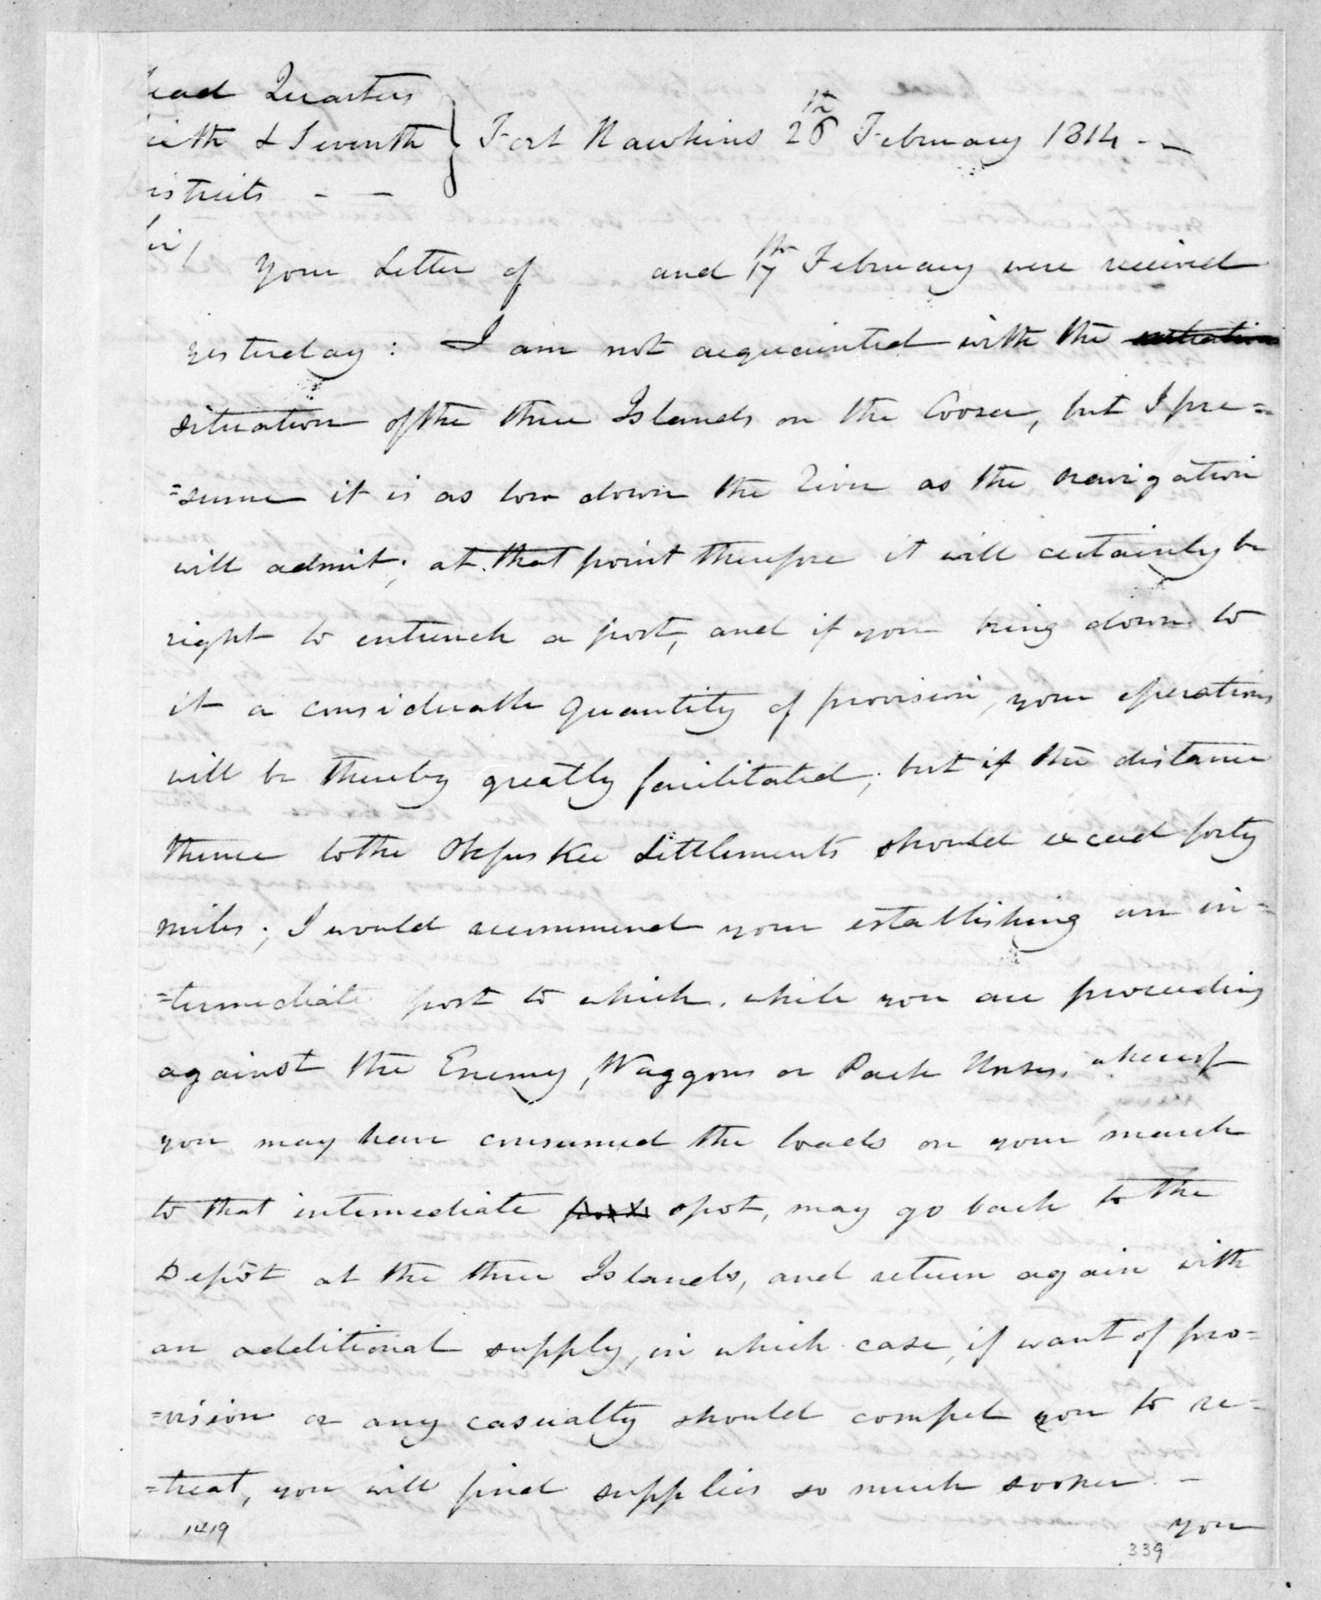 Thomas Pinckney to Andrew Jackson, February 26, 1814